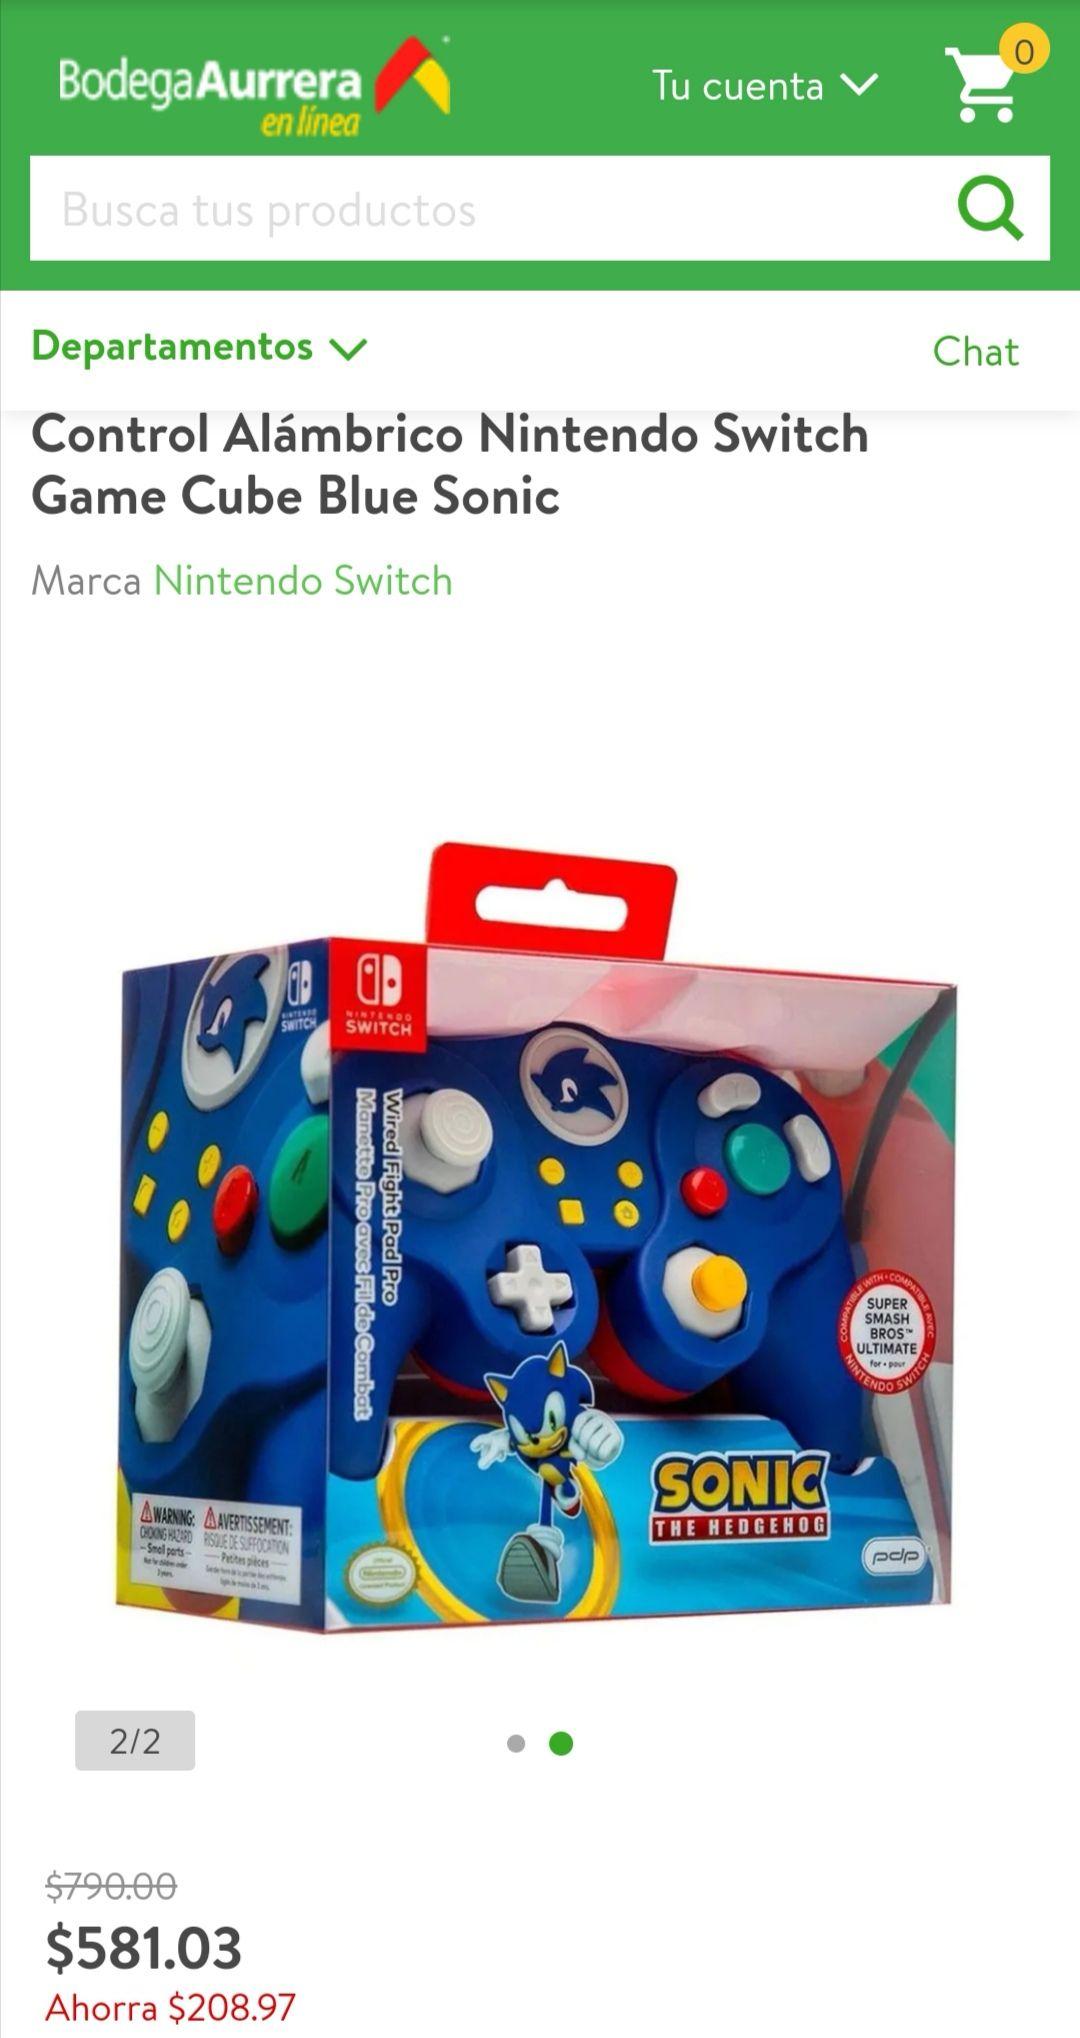 Bodega Aurrerá, Control Alámbrico Nintendo Switch Game Cube Blue Sonic y White Zelda